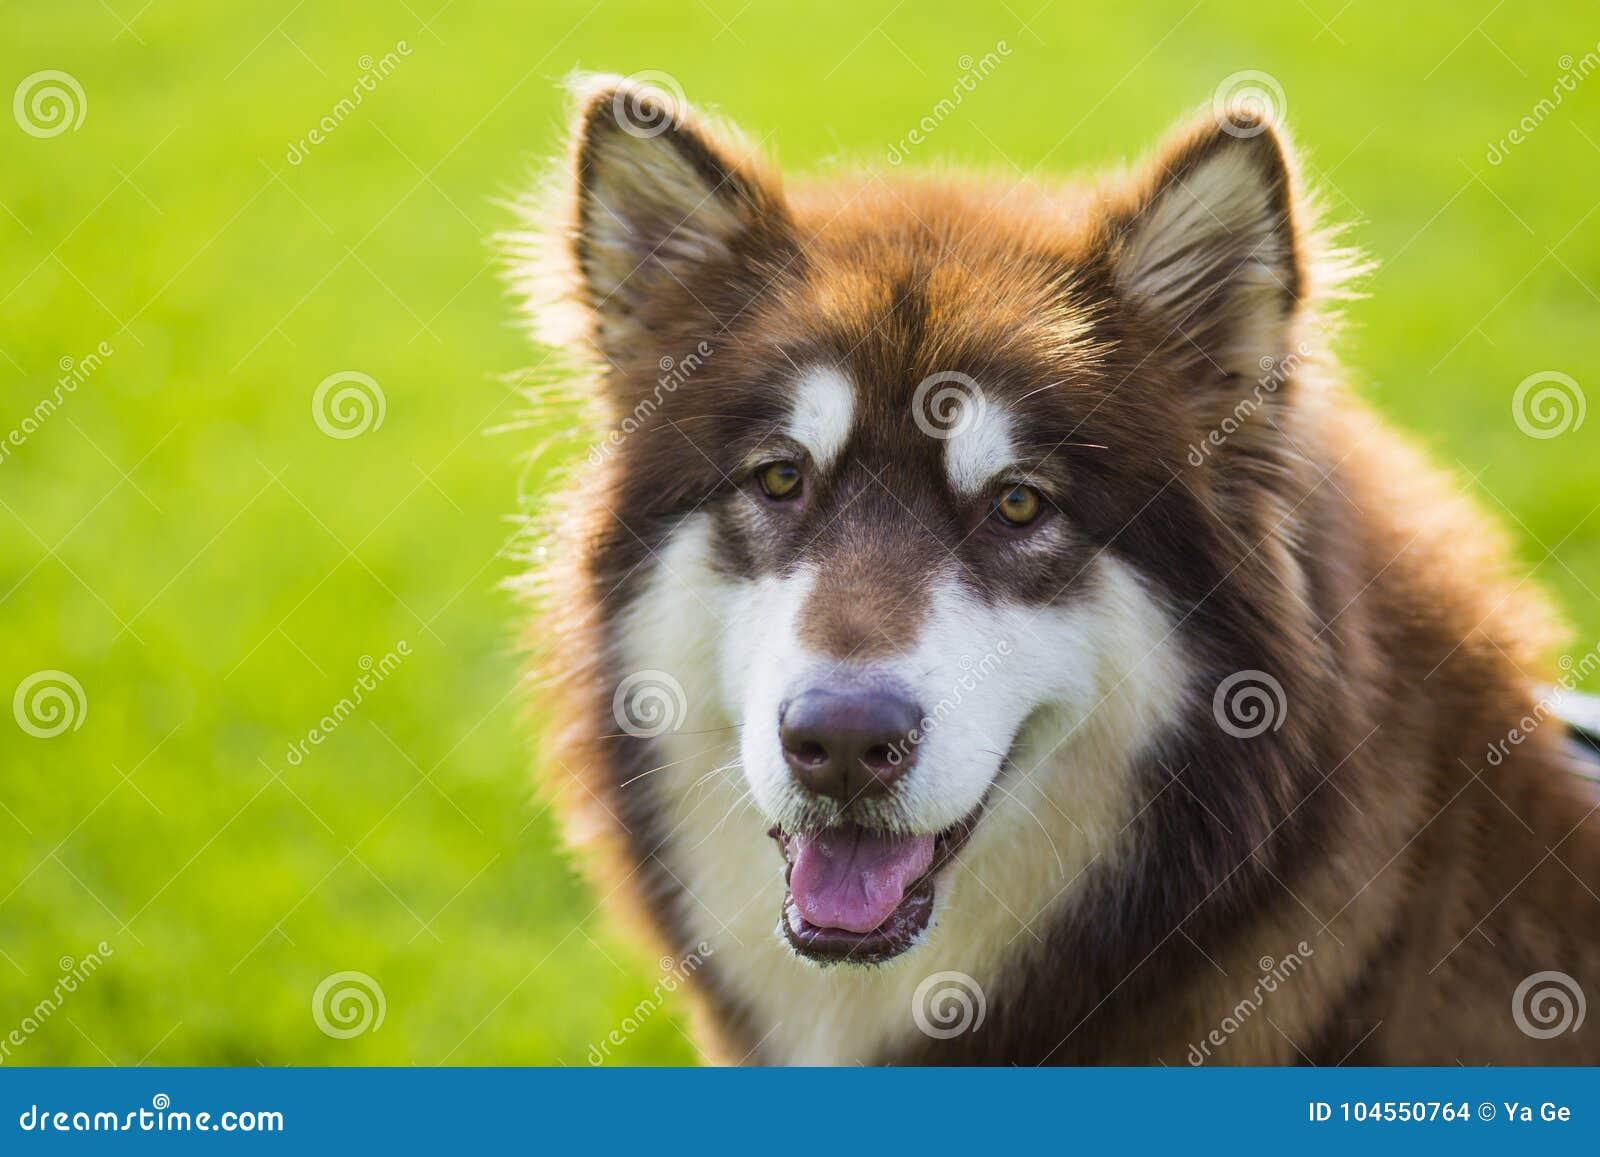 Giant Alaska Dog Stock Photo Image Of Name Eskimo 104550764